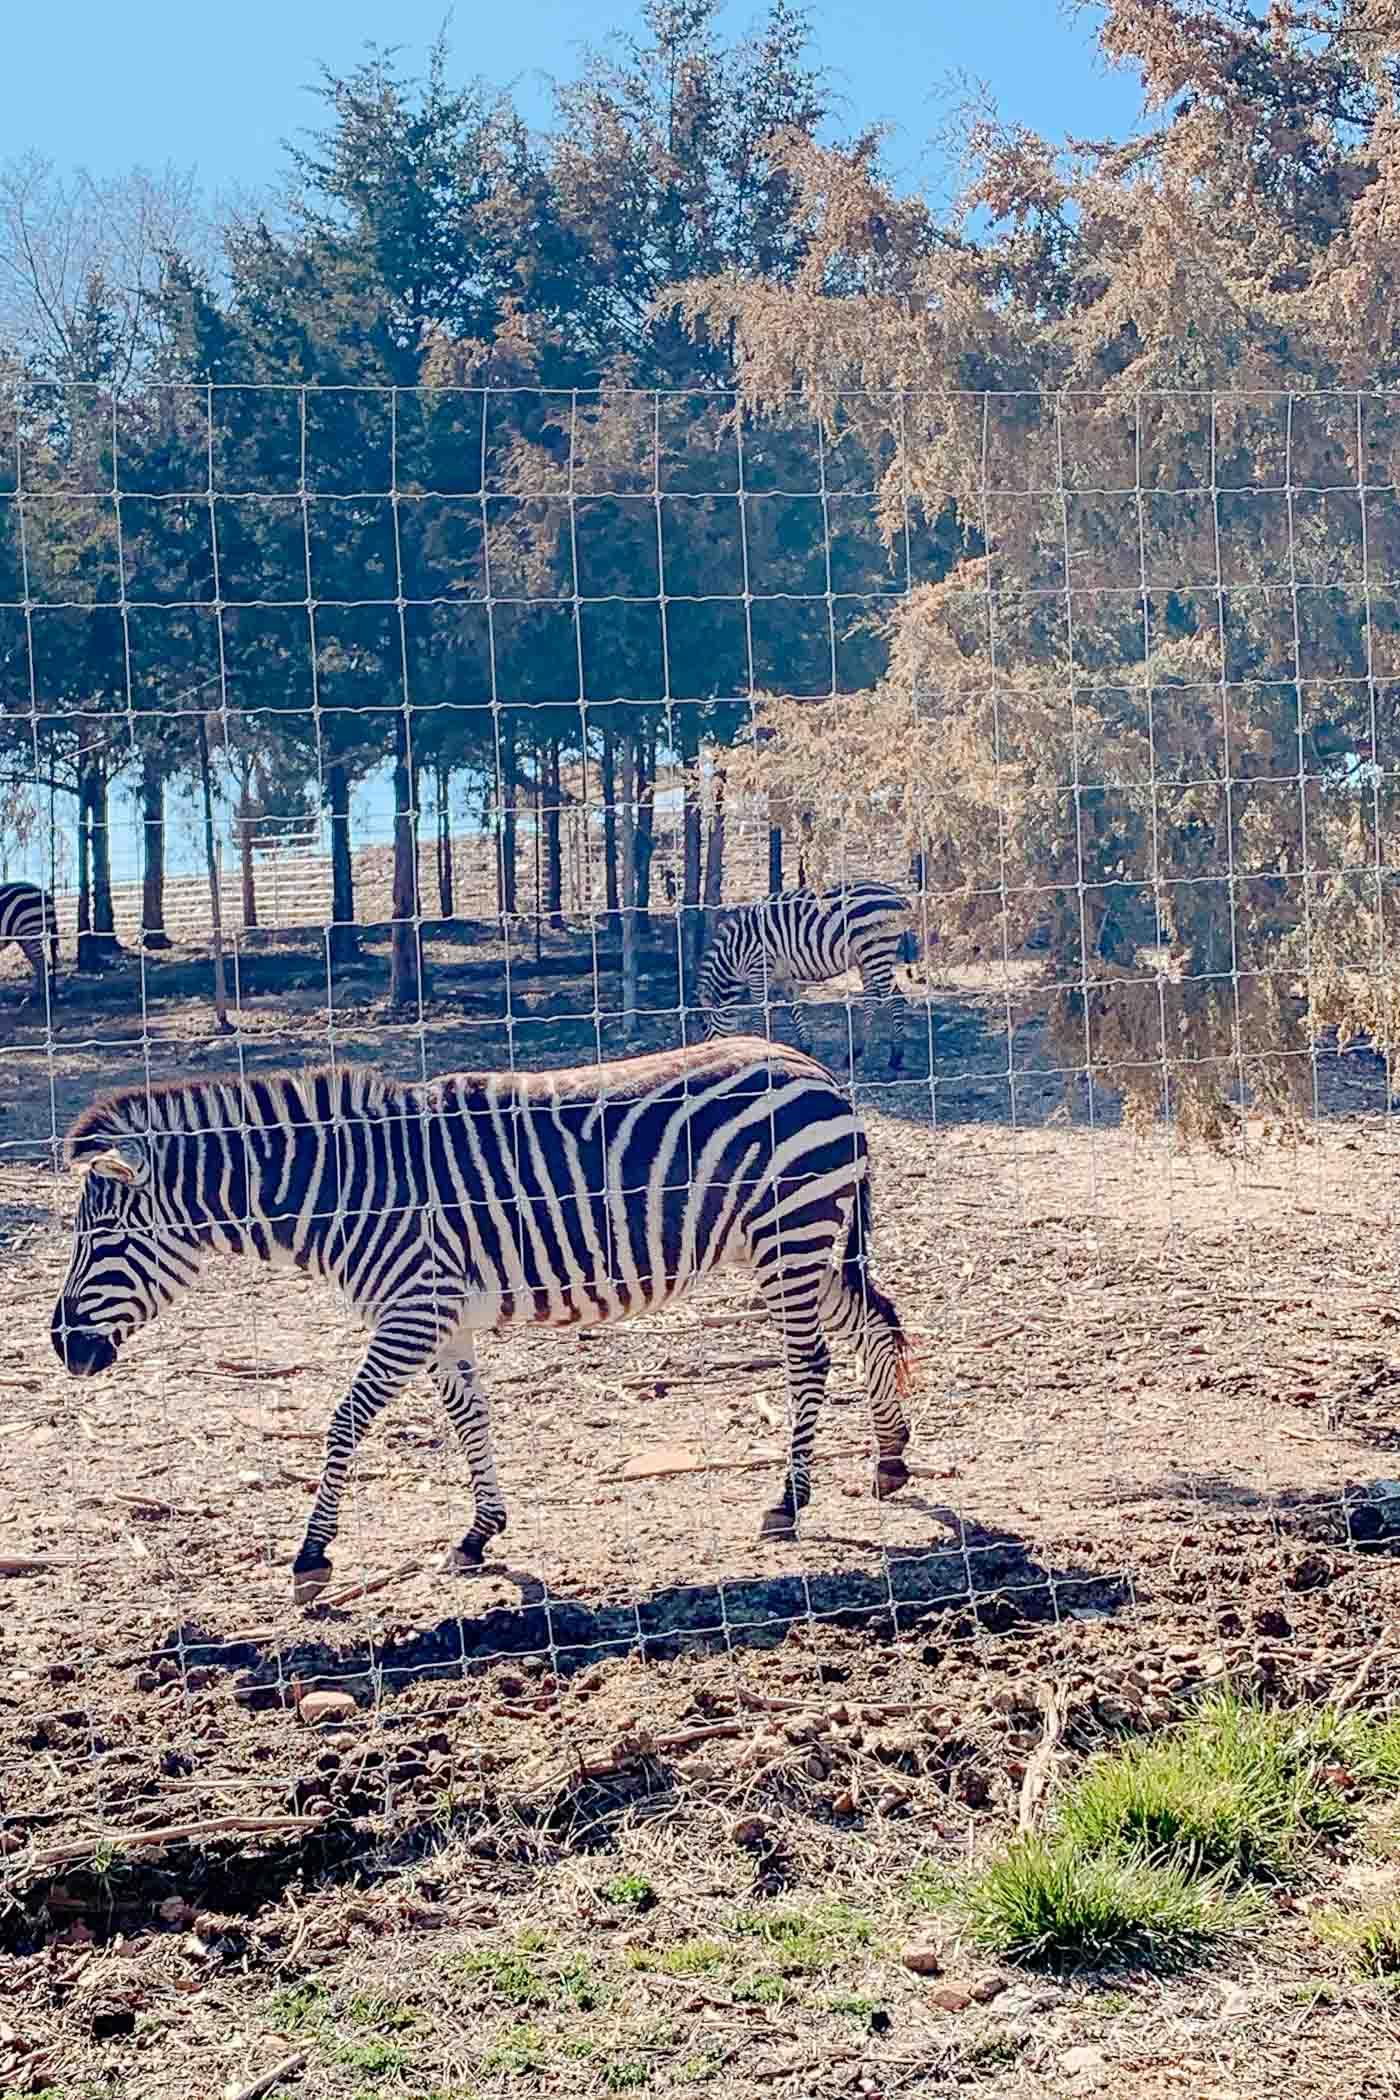 Zebras standing behind zoo fencing in Branson Missouri.